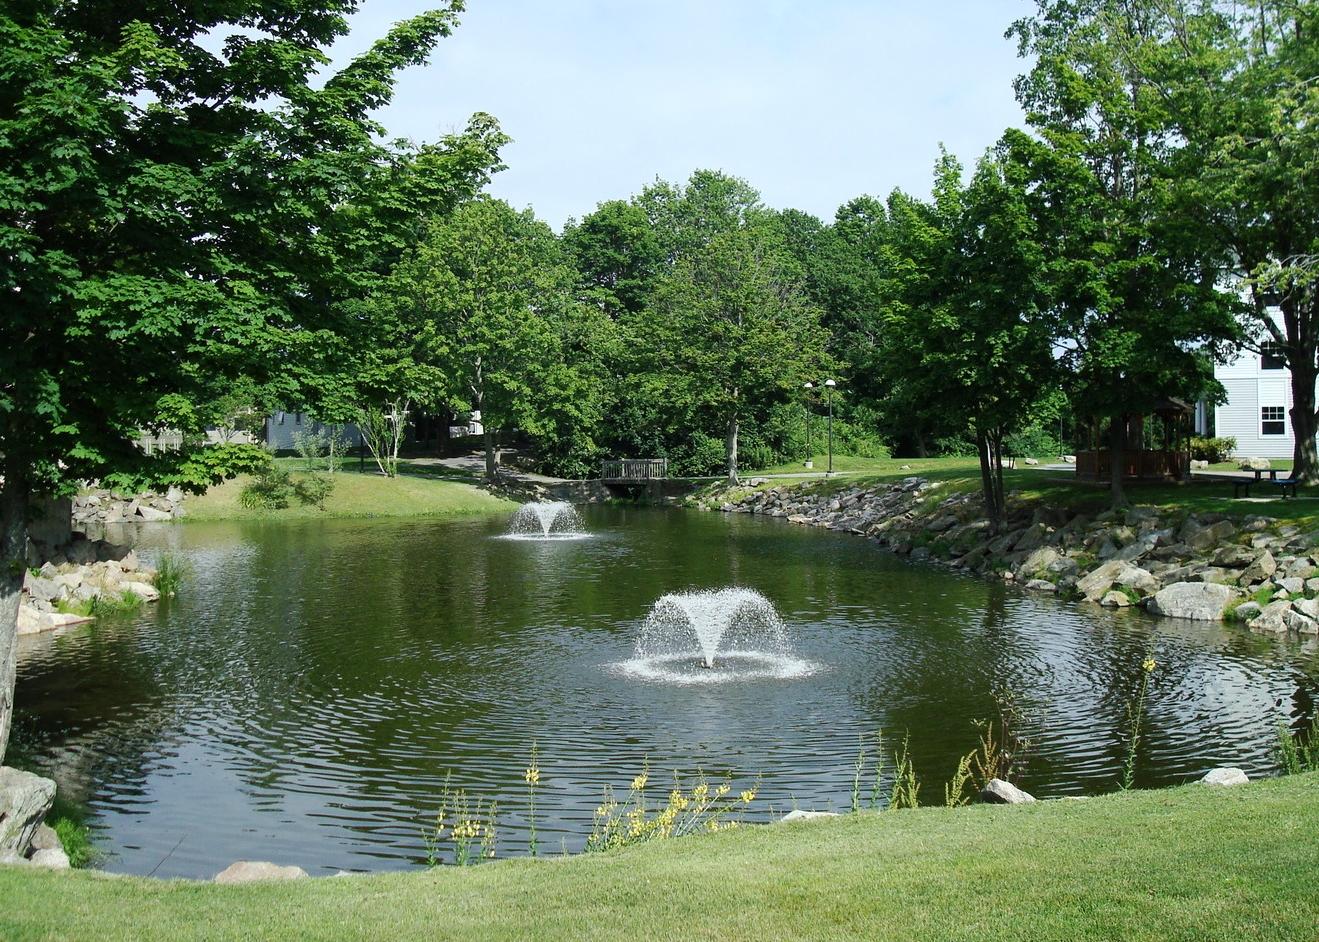 RWU_Fountain_Pond.jpg